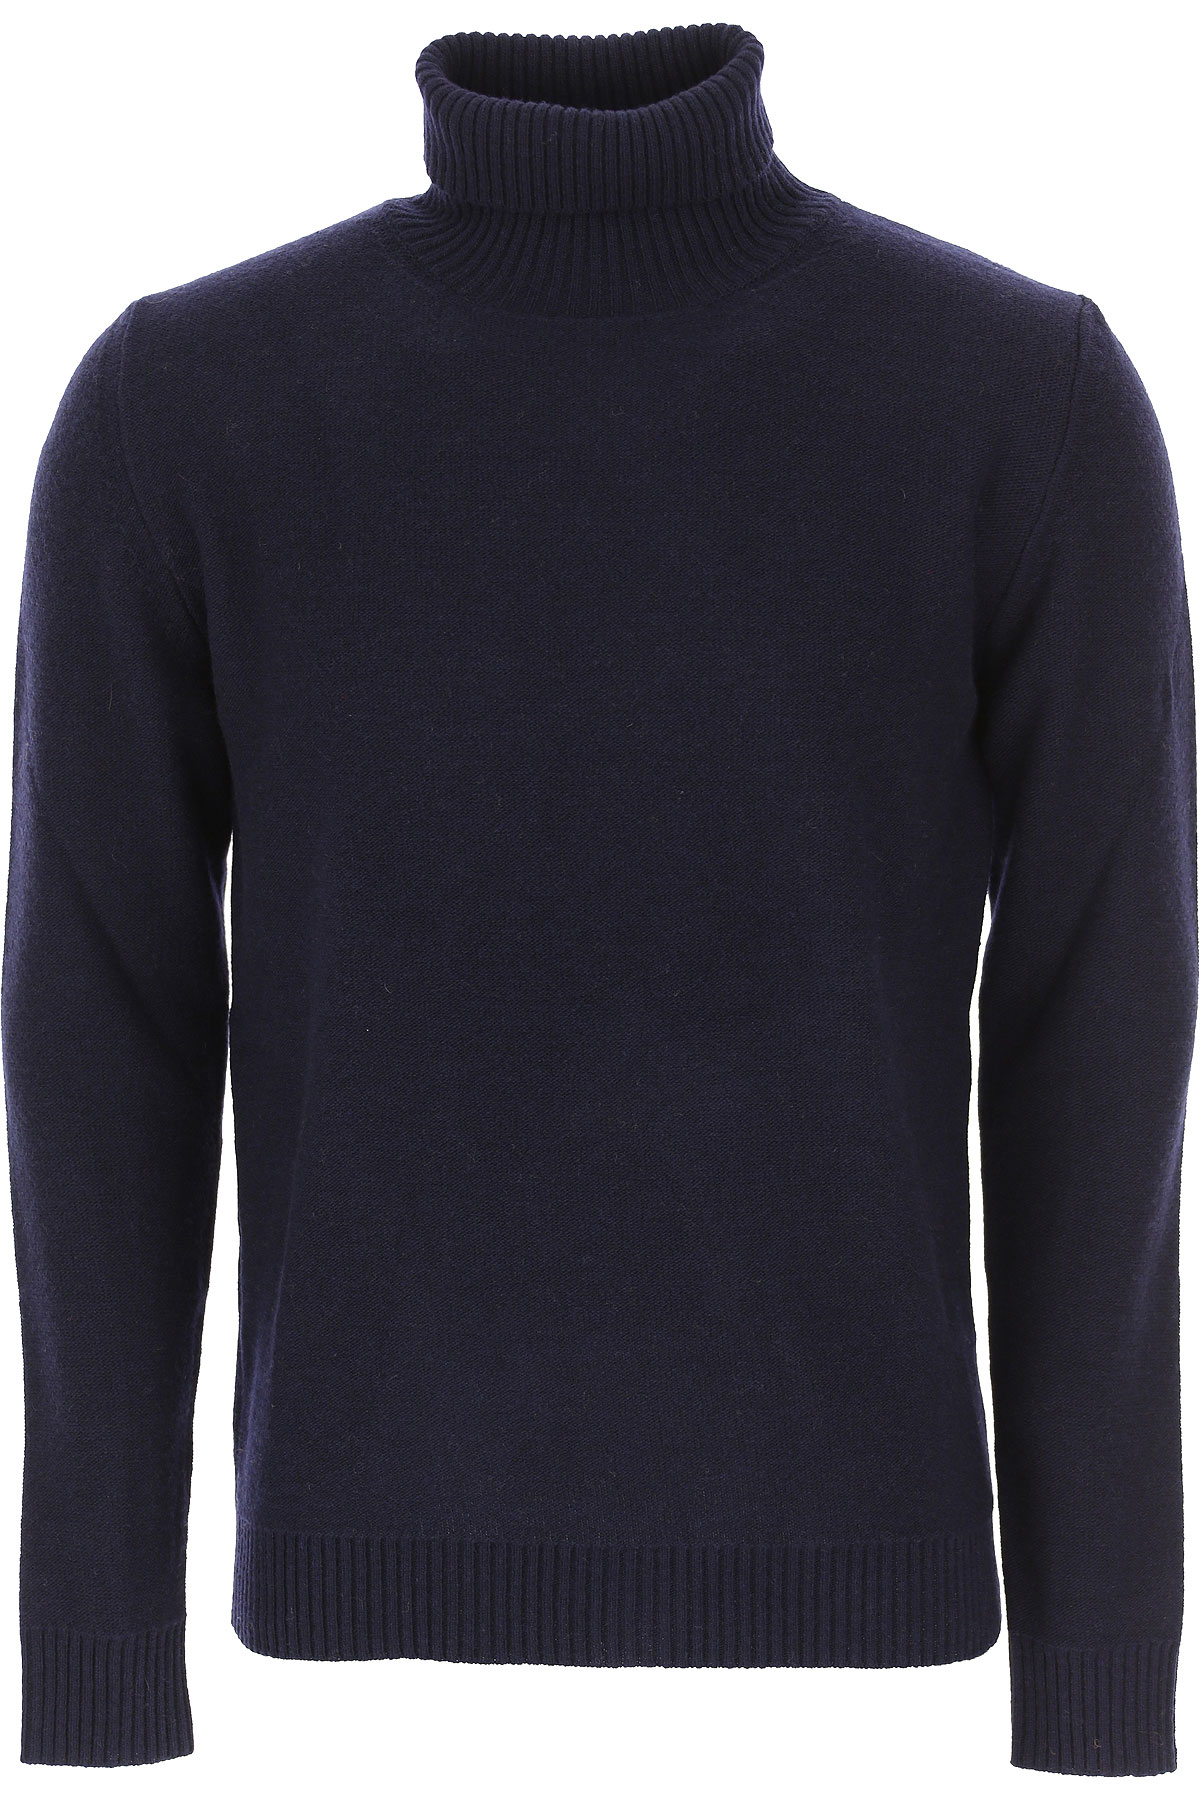 The Gigi Sweater for Men Jumper On Sale, Dark Blue, Wool, 2019, L M S XL